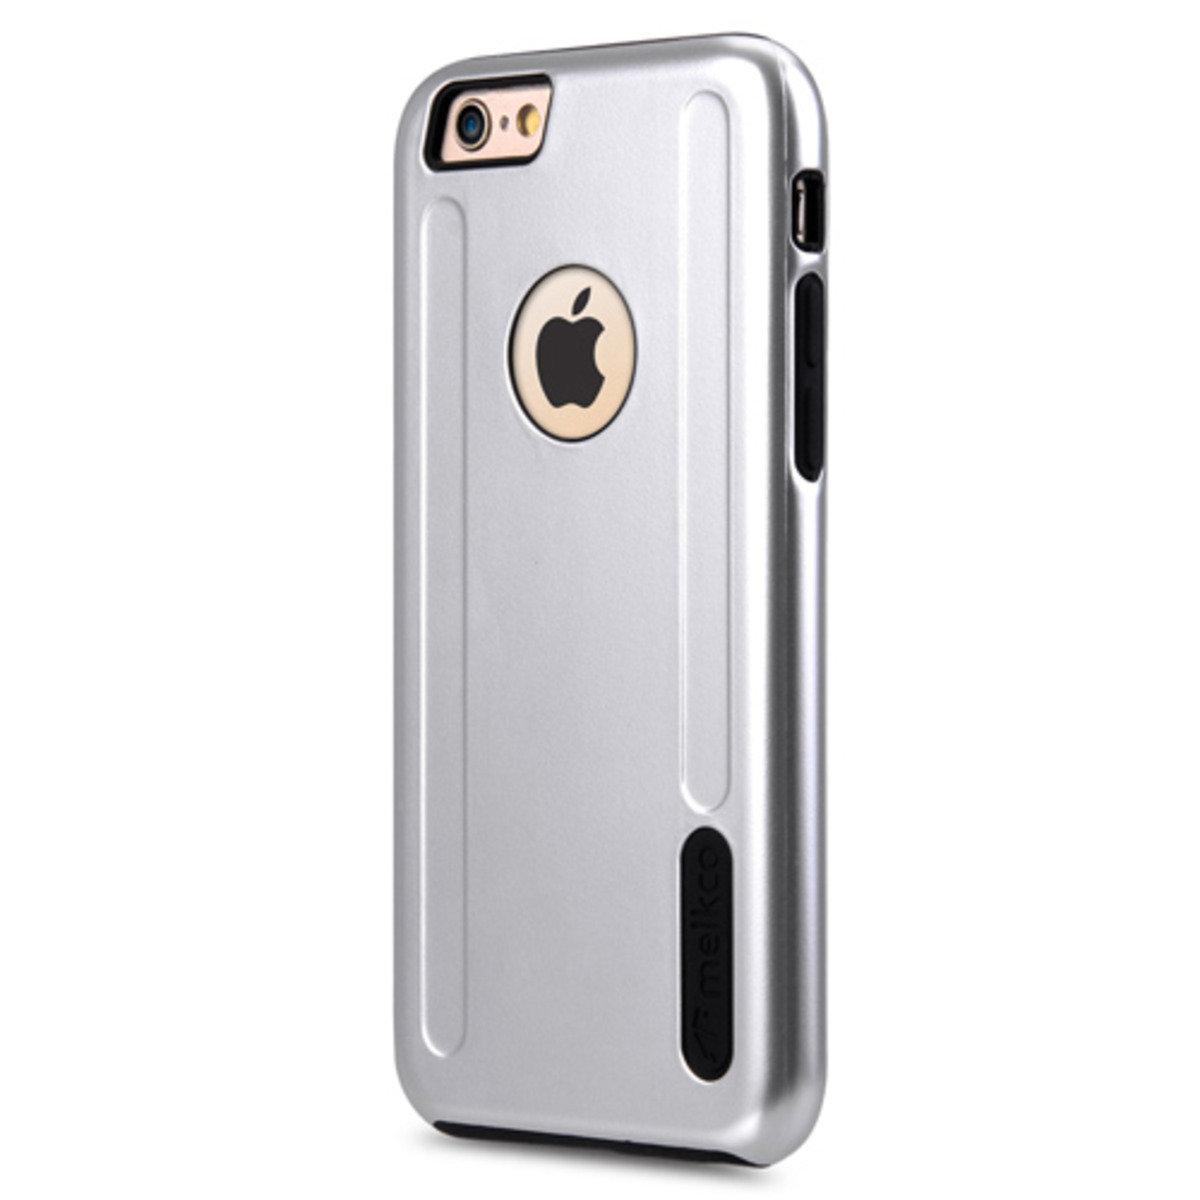 "Apple iPhone 6s (4.7"") Special Edition Metallic Kubalt 雙層保護殼 (可見蘋果標誌)- 銀色/黑色"